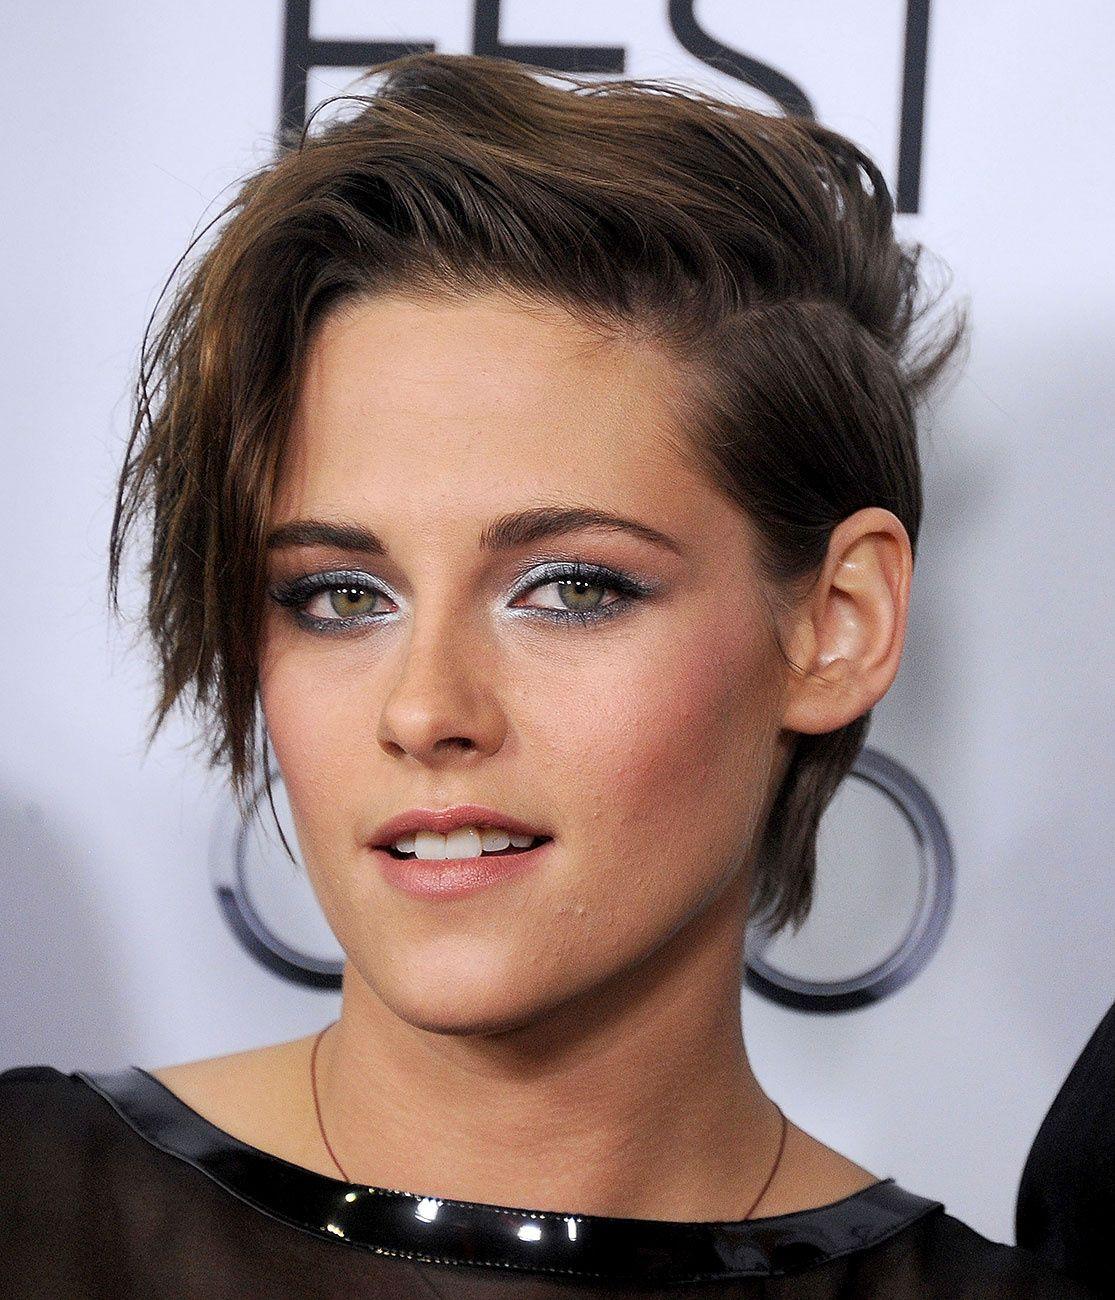 Los Mejores Peinados Del Otoo Kristen Stewart Haircuts And Pixies